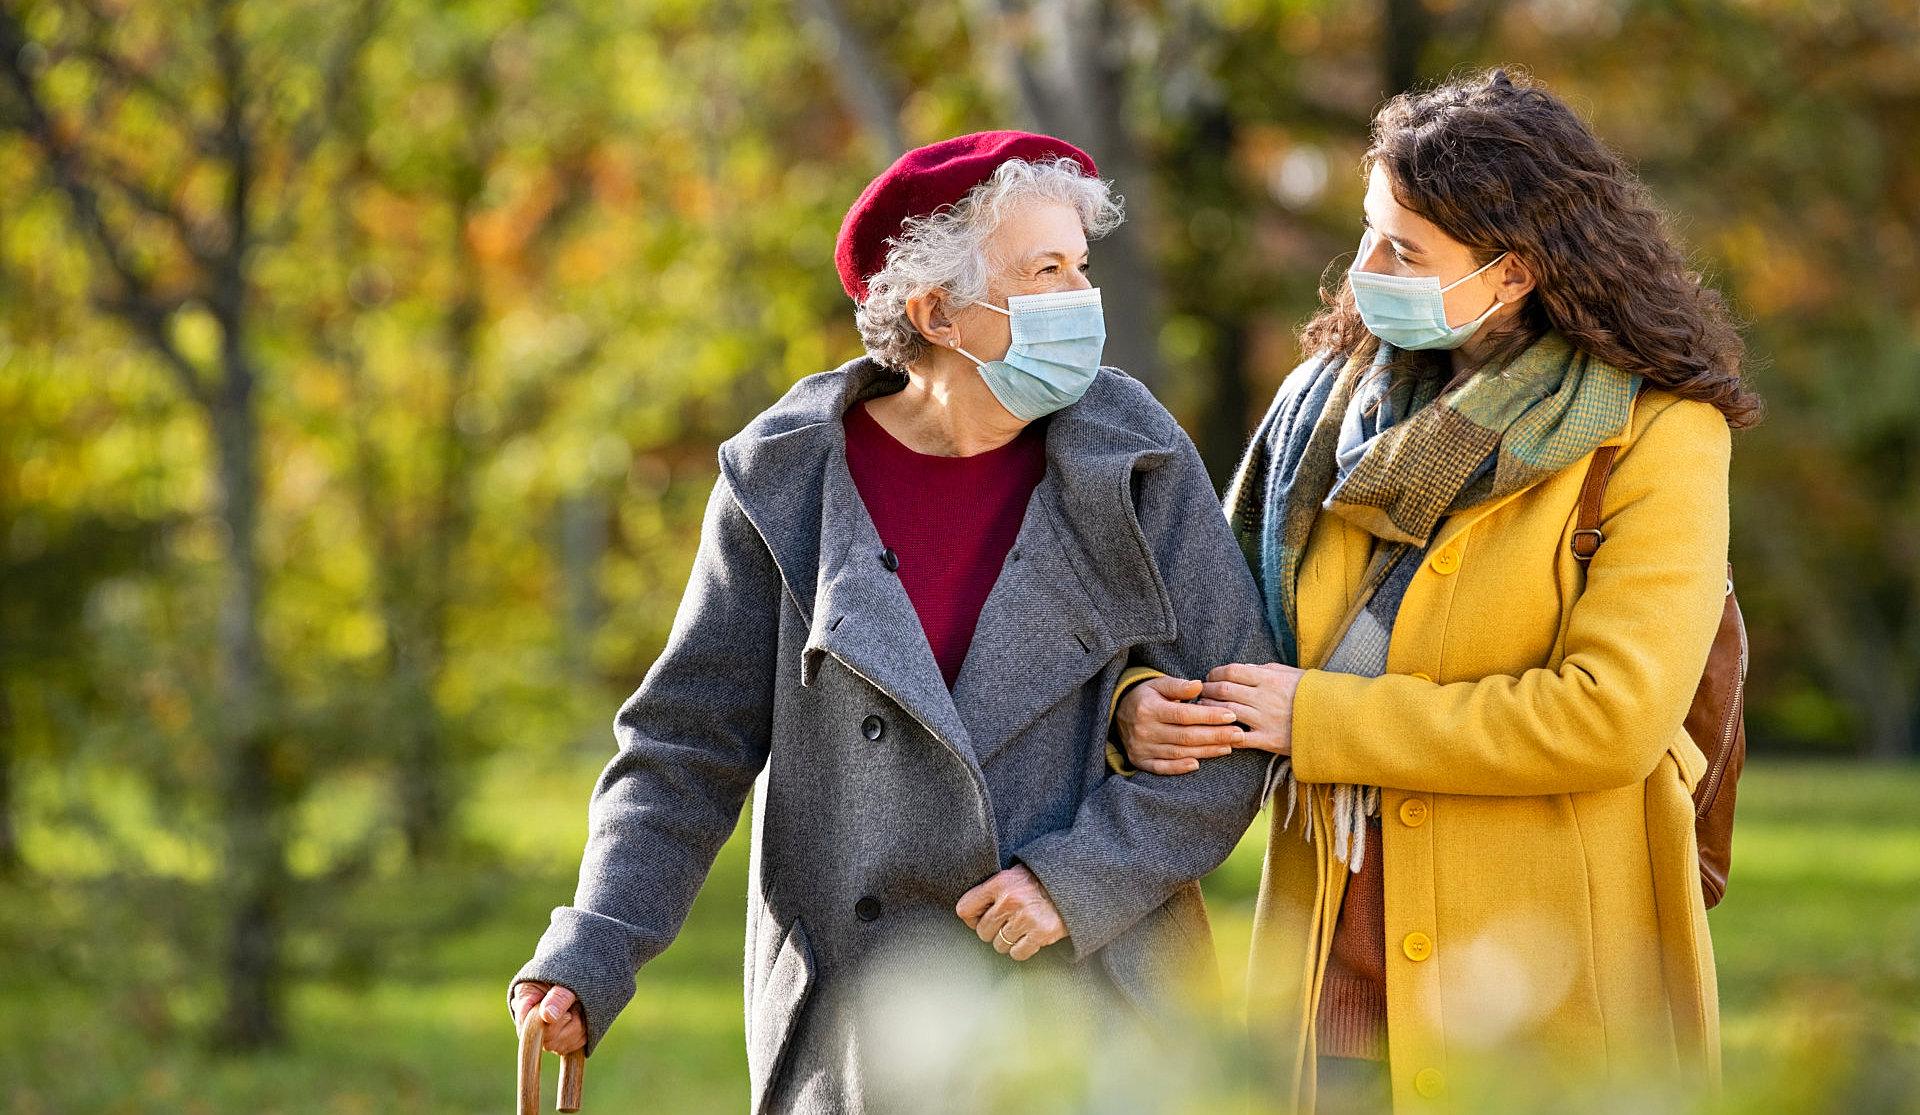 woman and elder lady walking